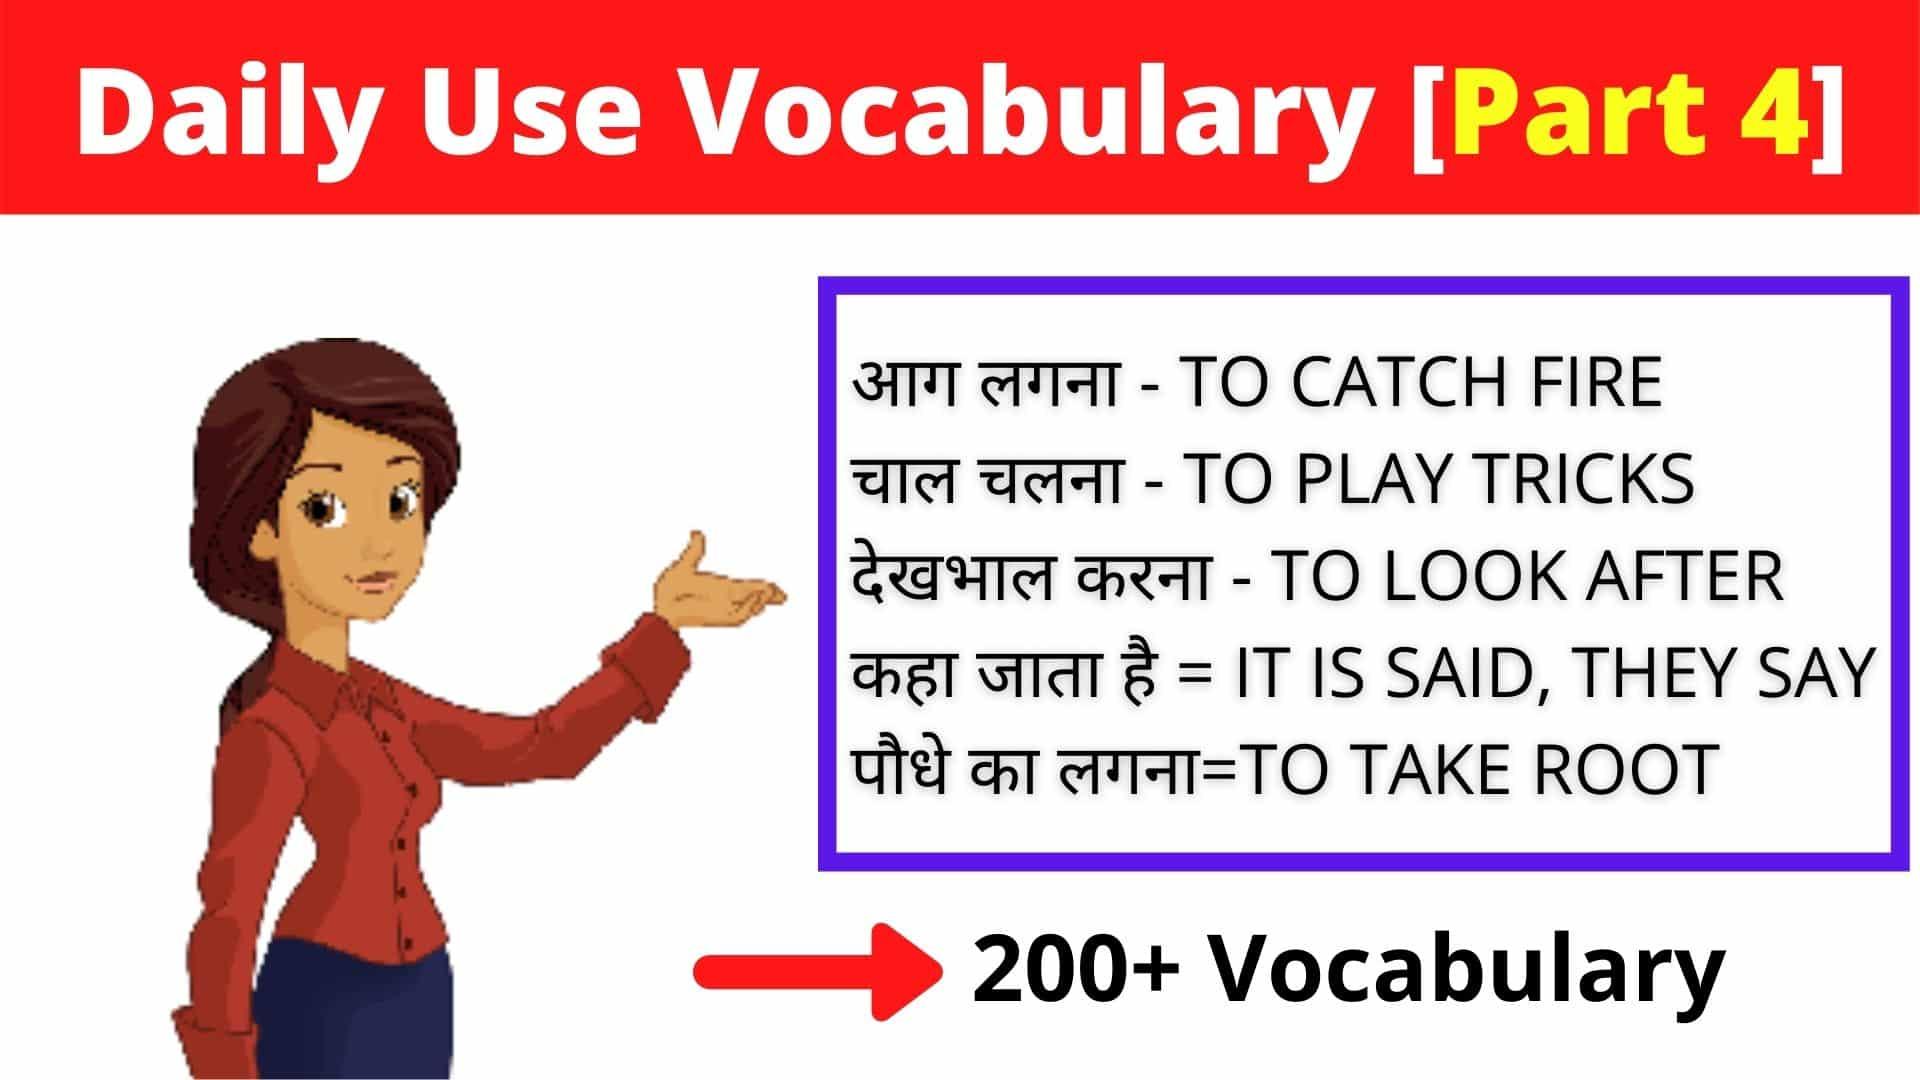 Daily-Use-Vocabulary